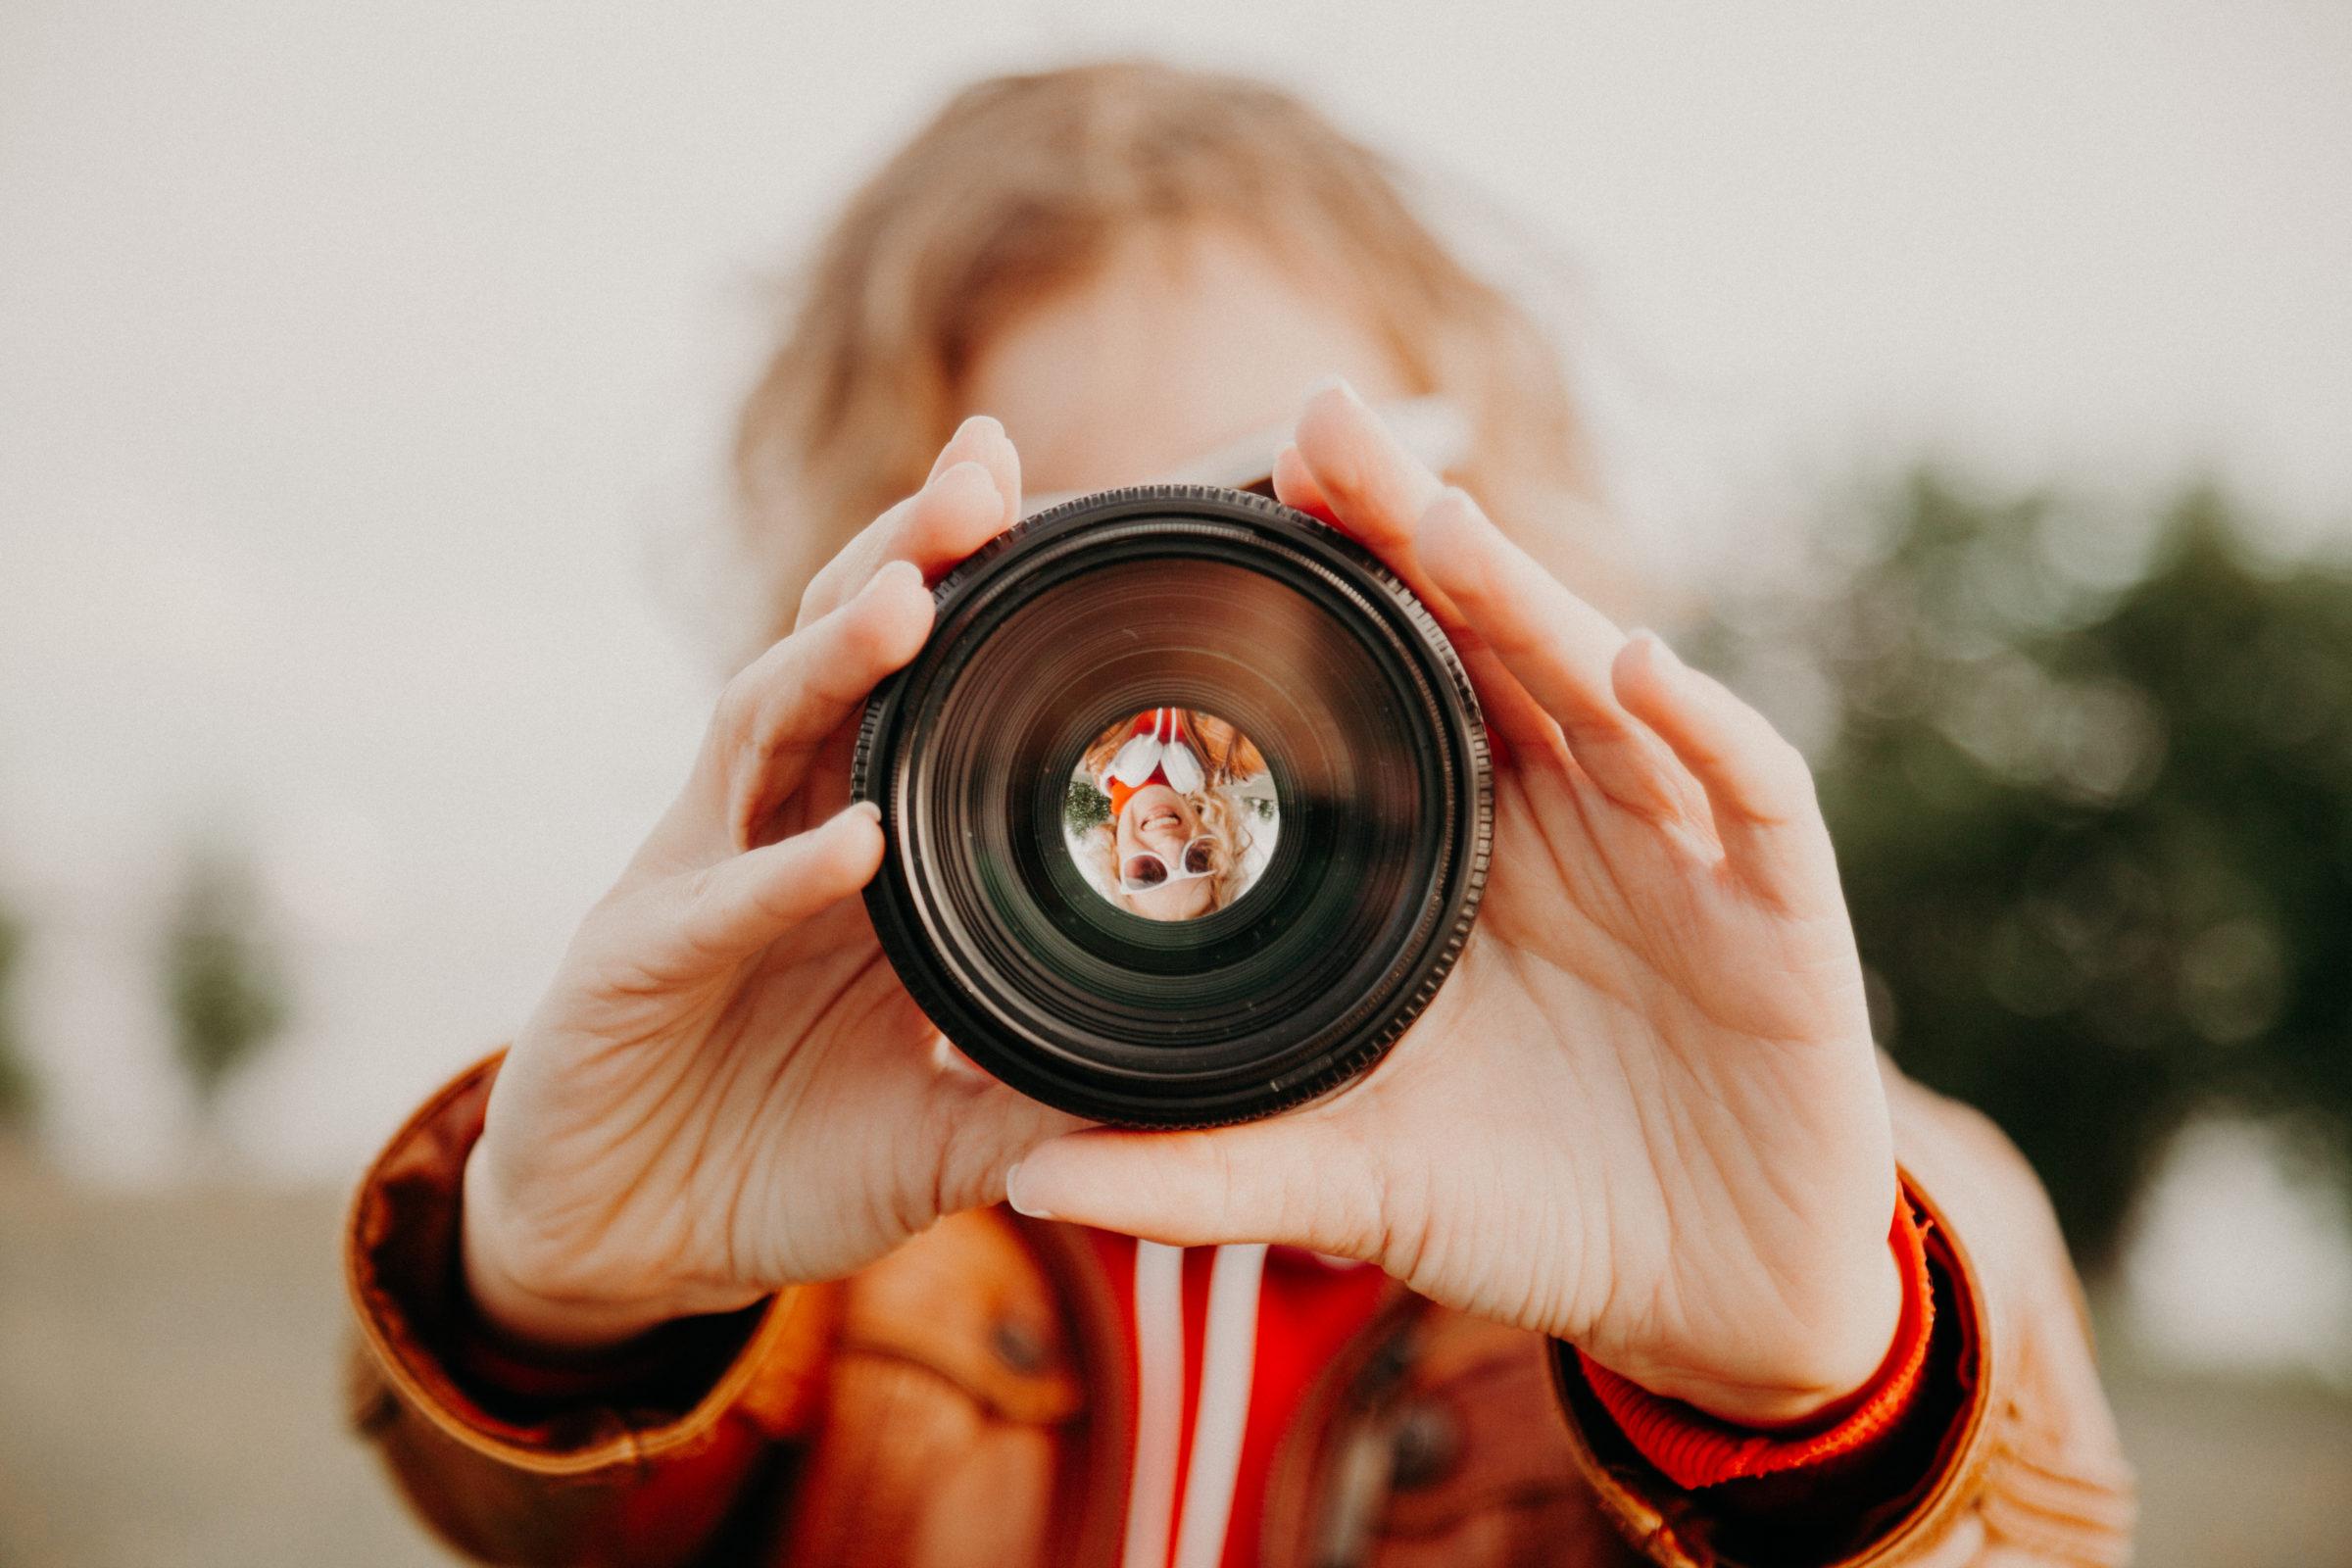 young woman looking through camera lens photograph SEKDFMB